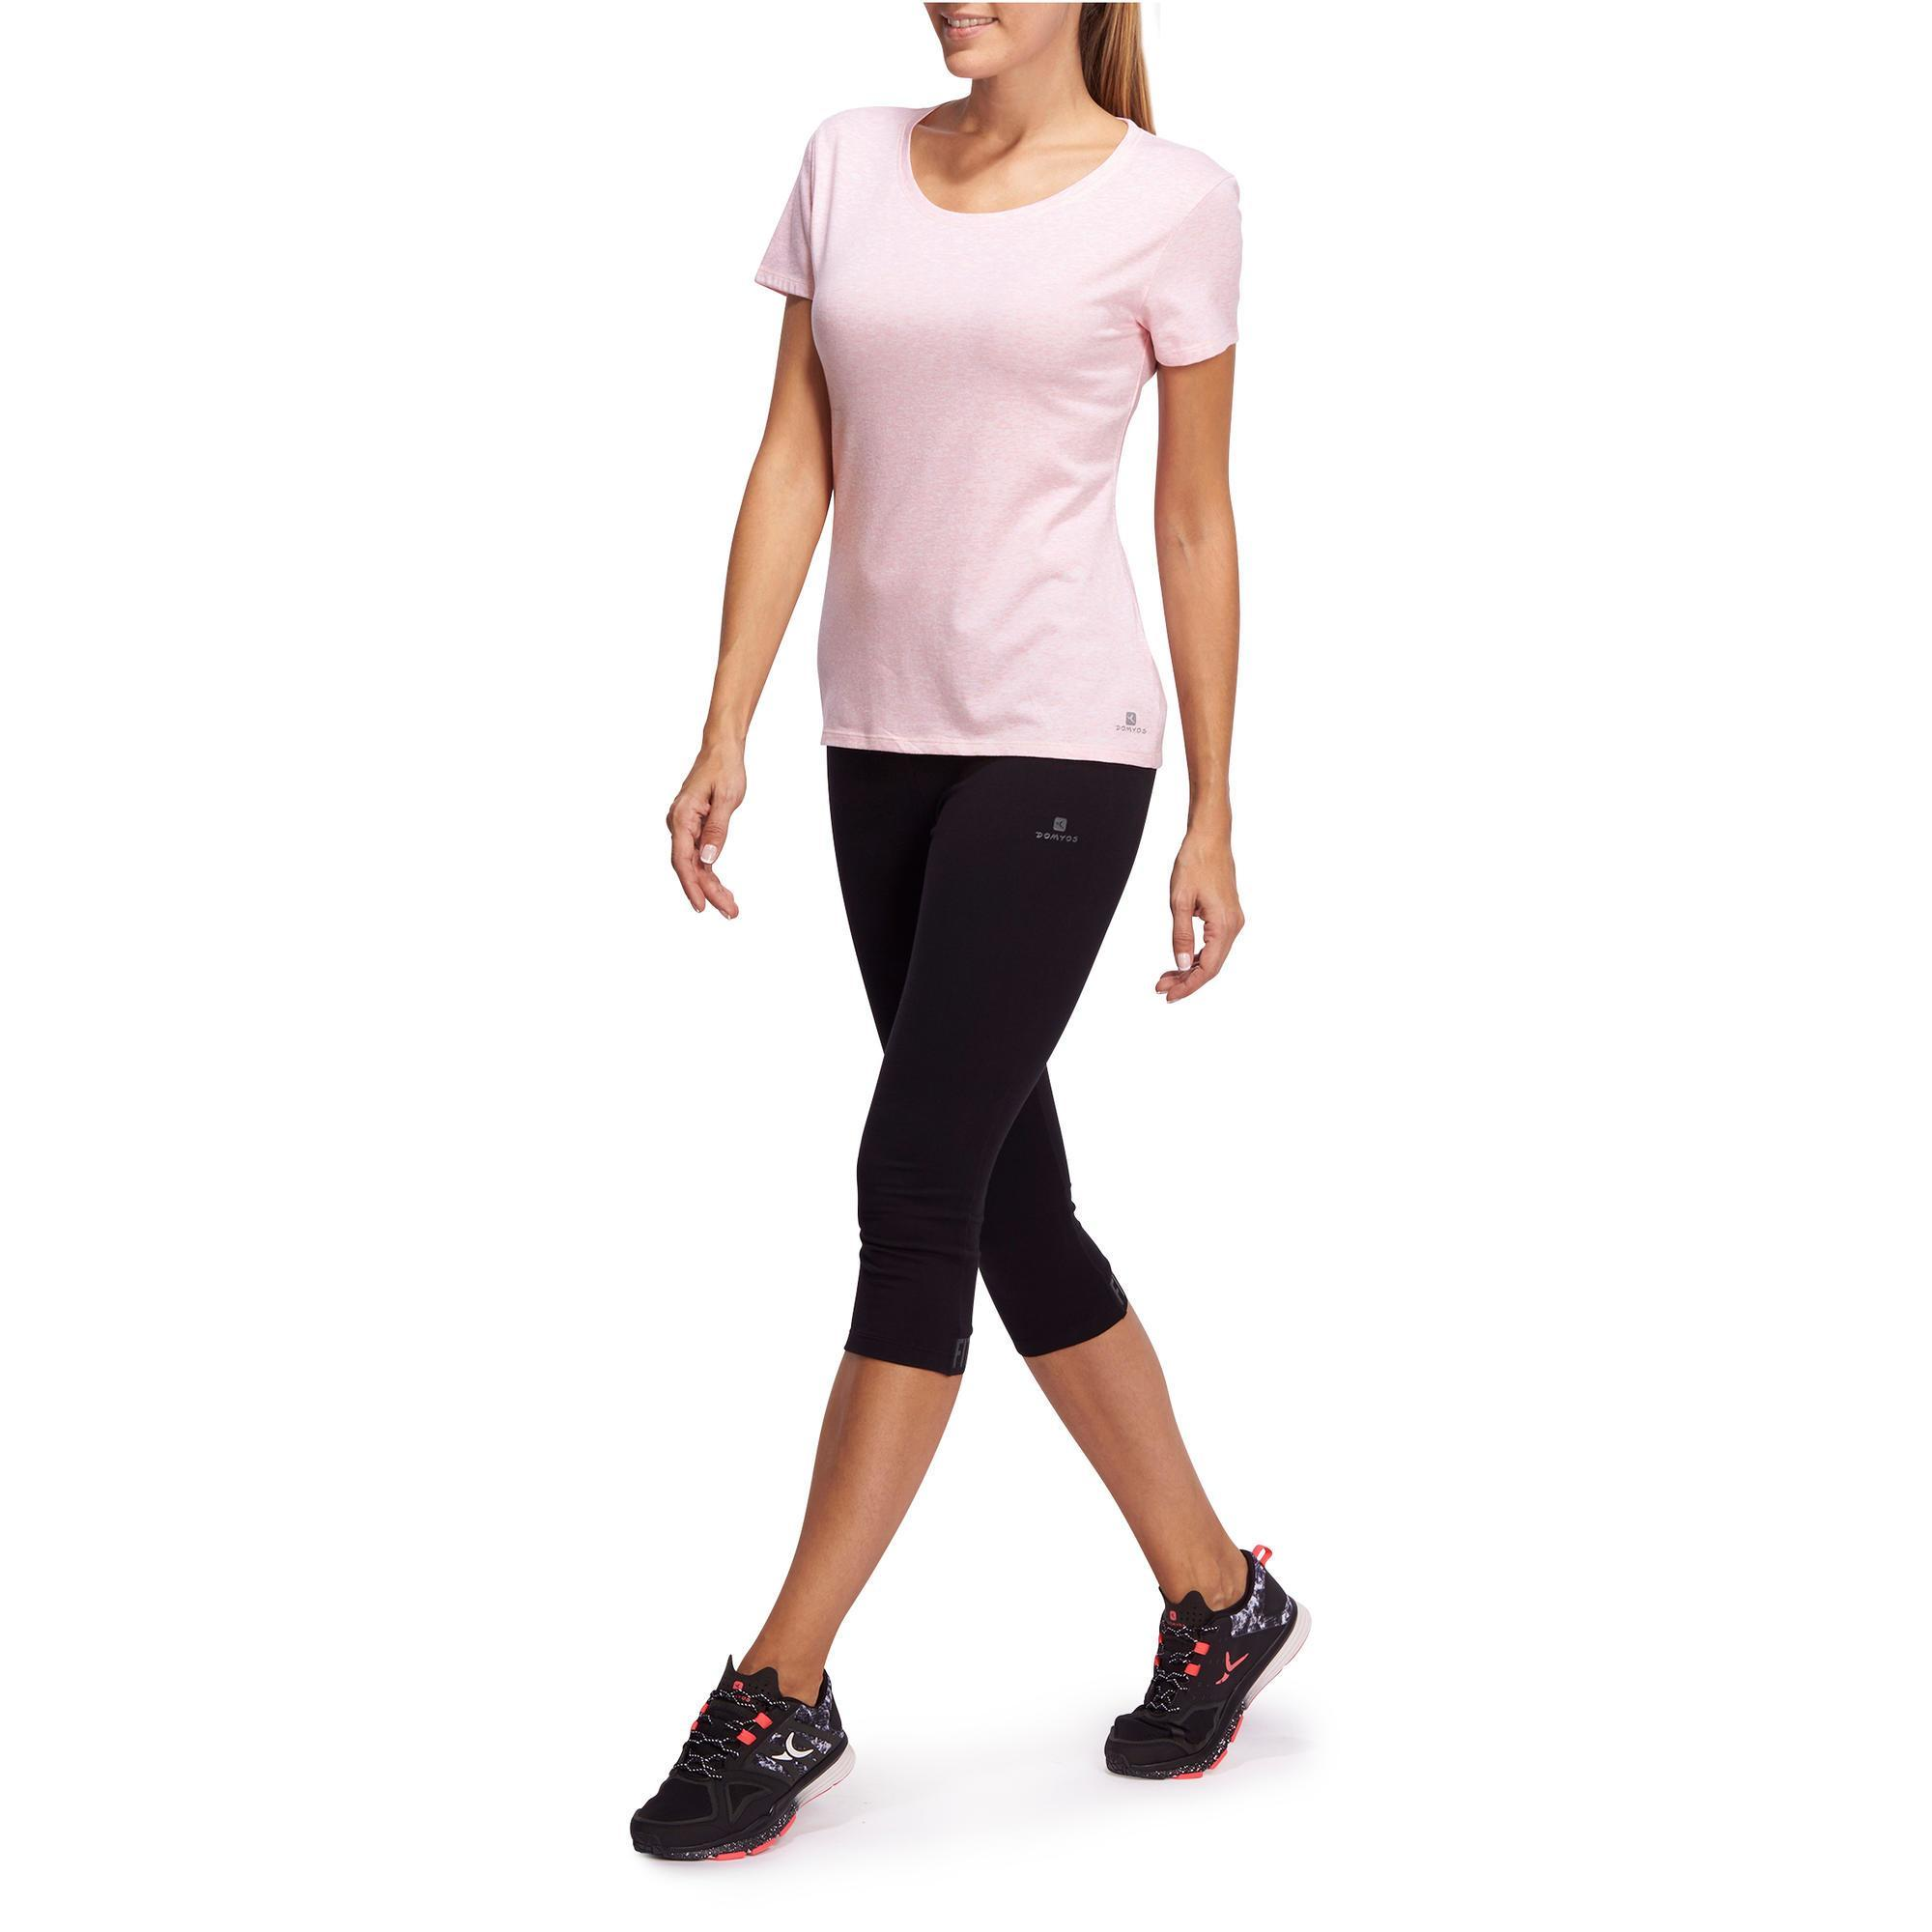 Domyos Y Manga Camiseta Regular Pilates Mujer Gimnasia Corta 500 RwnwSZx a6bc612551744